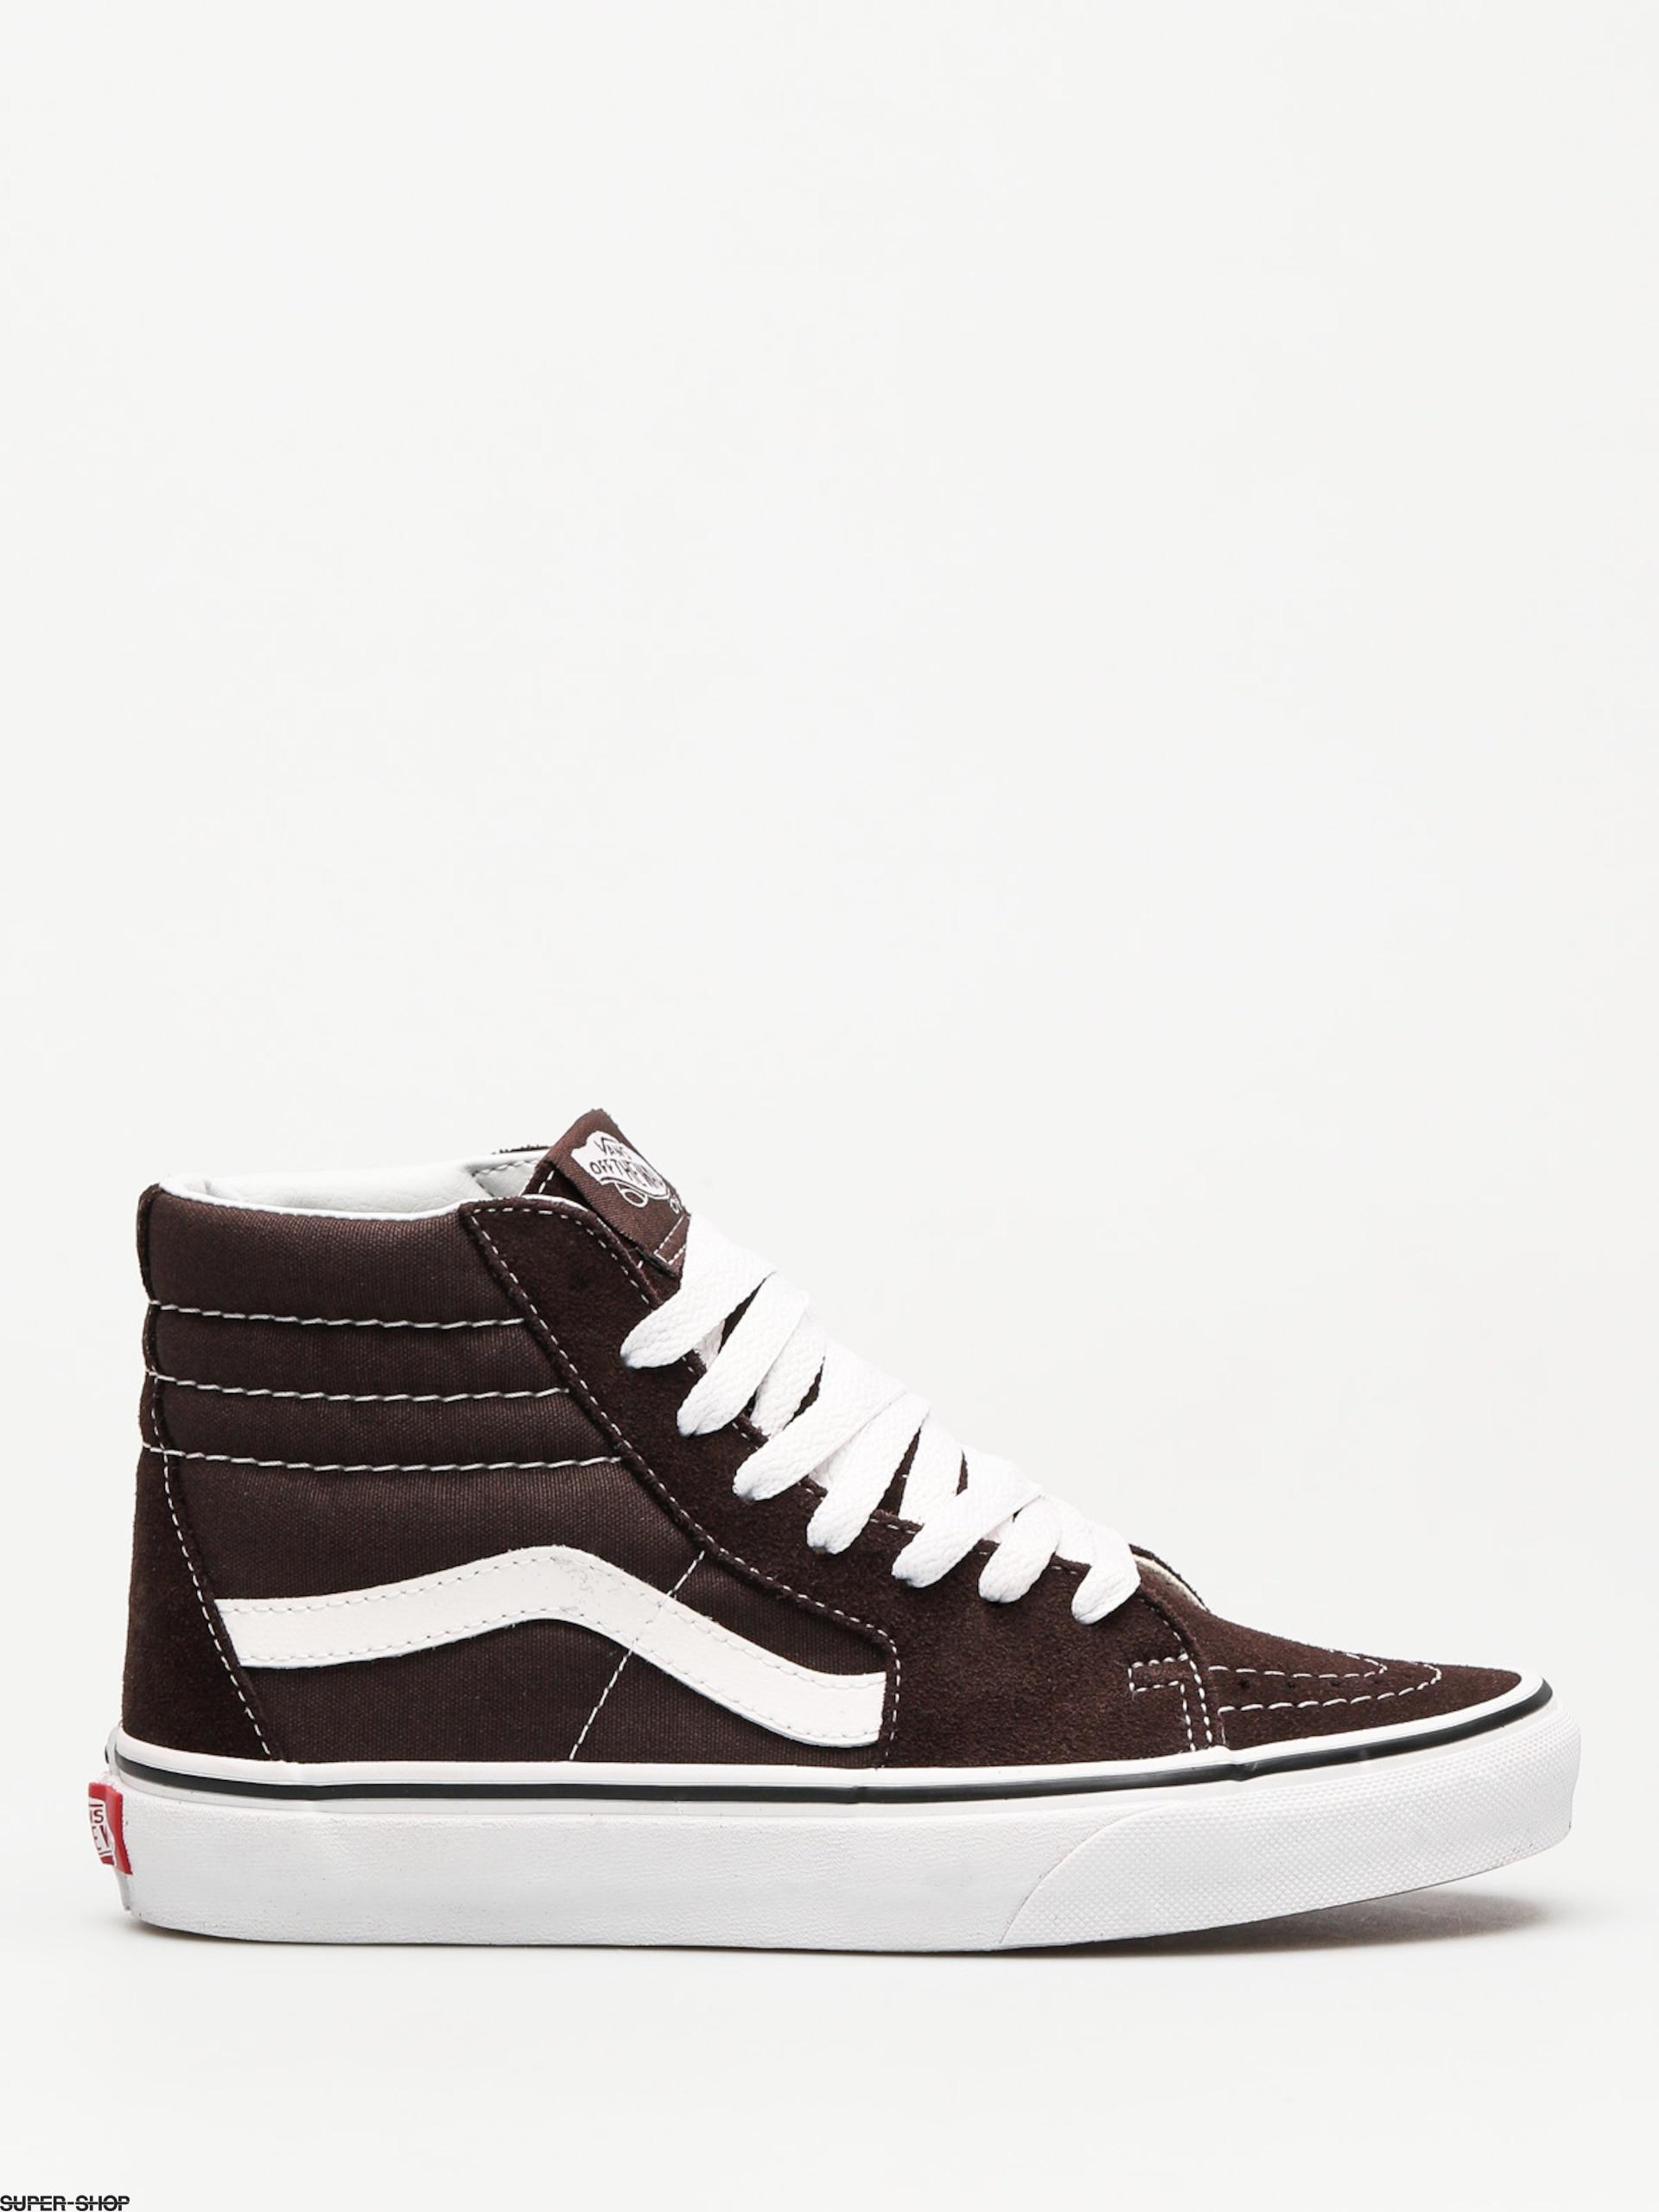 8fe1275a198 949065-w1920-vans-shoes-sk8-hi-chocolate-torte-true-white.jpg